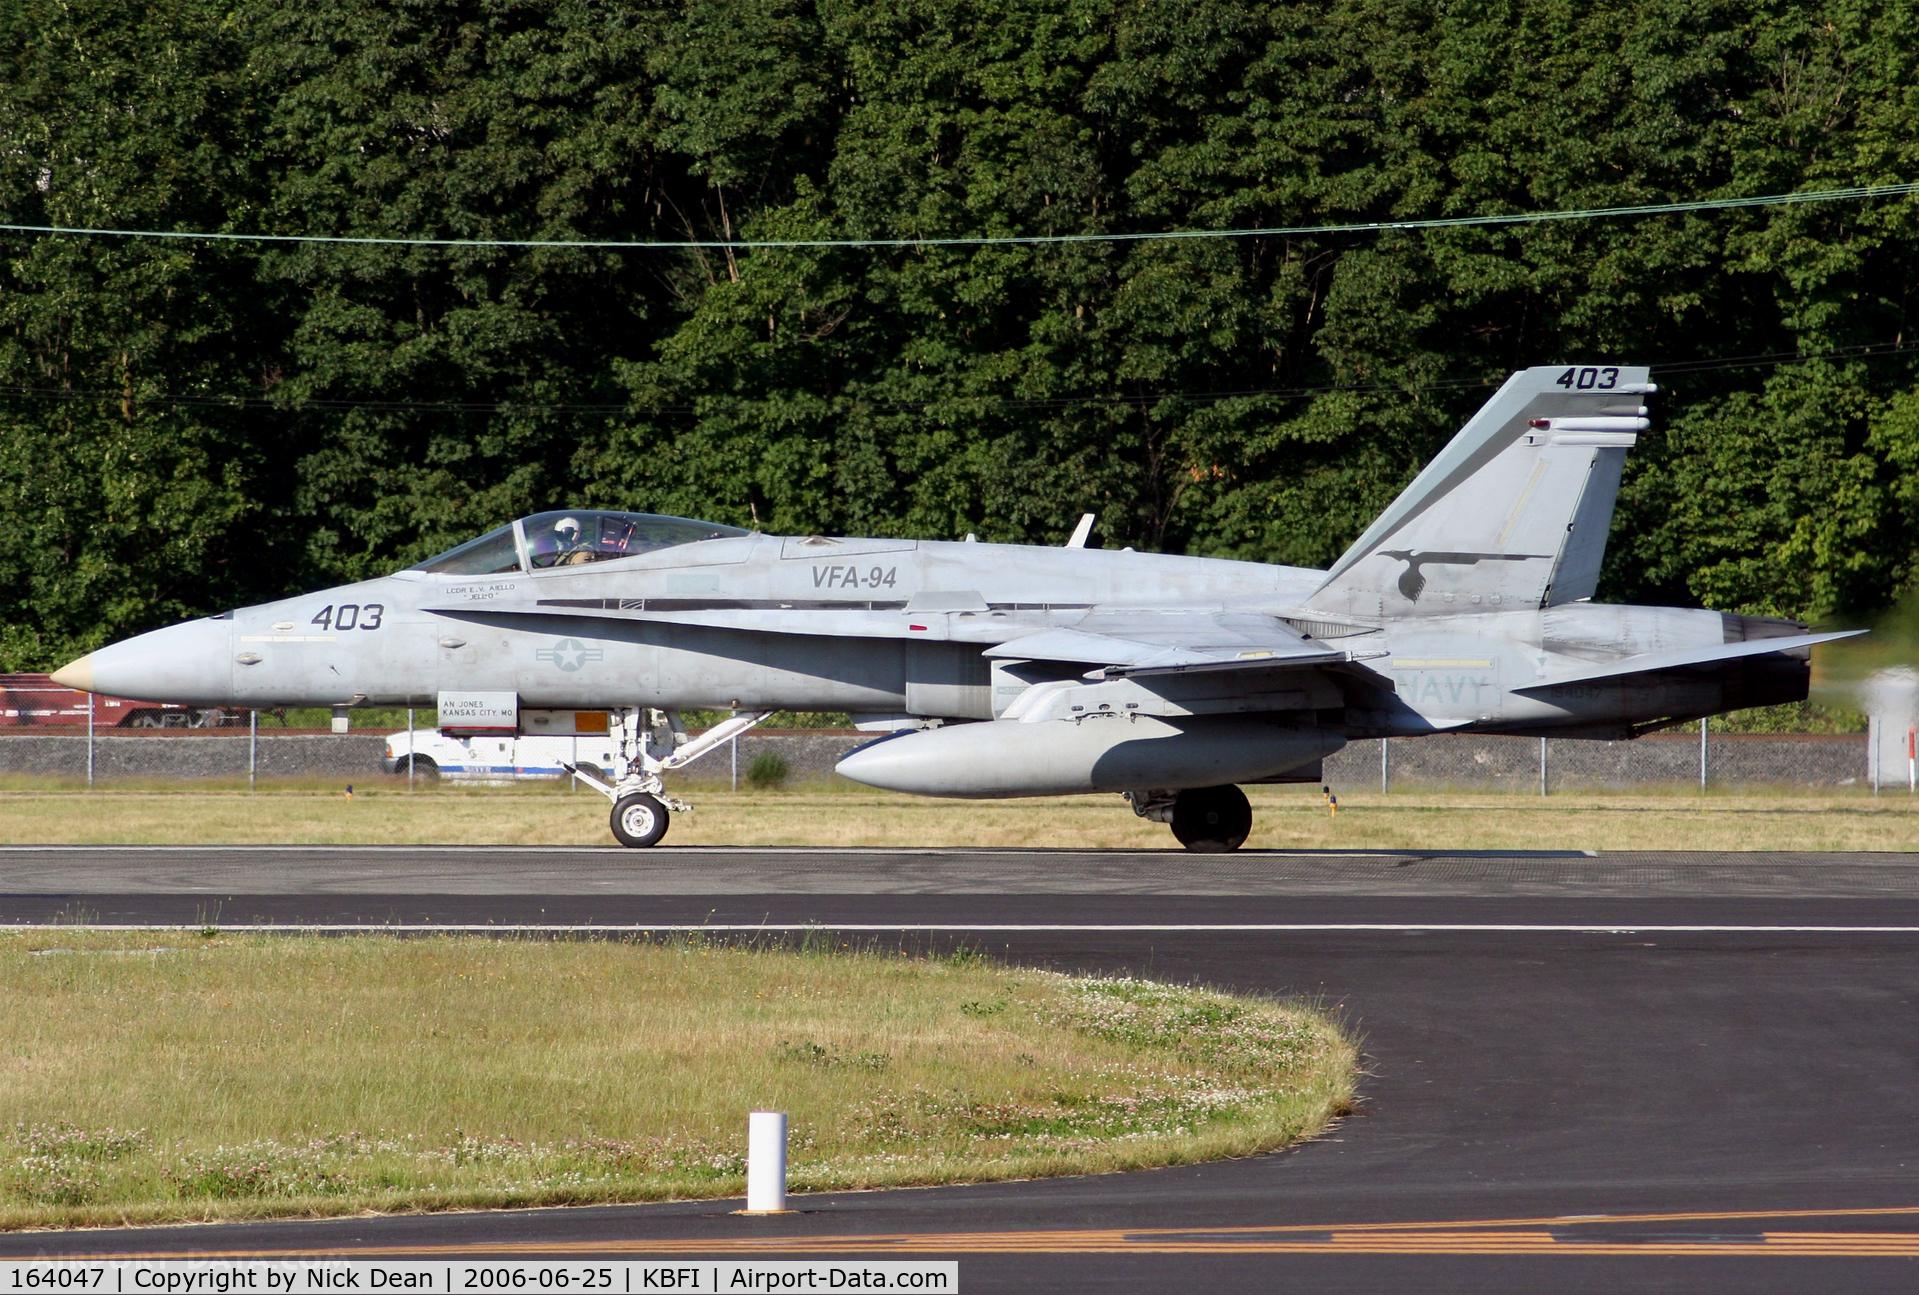 164047, 1990 McDonnell Douglas F/A-18C Hornet C/N 0935, KBFI departing as